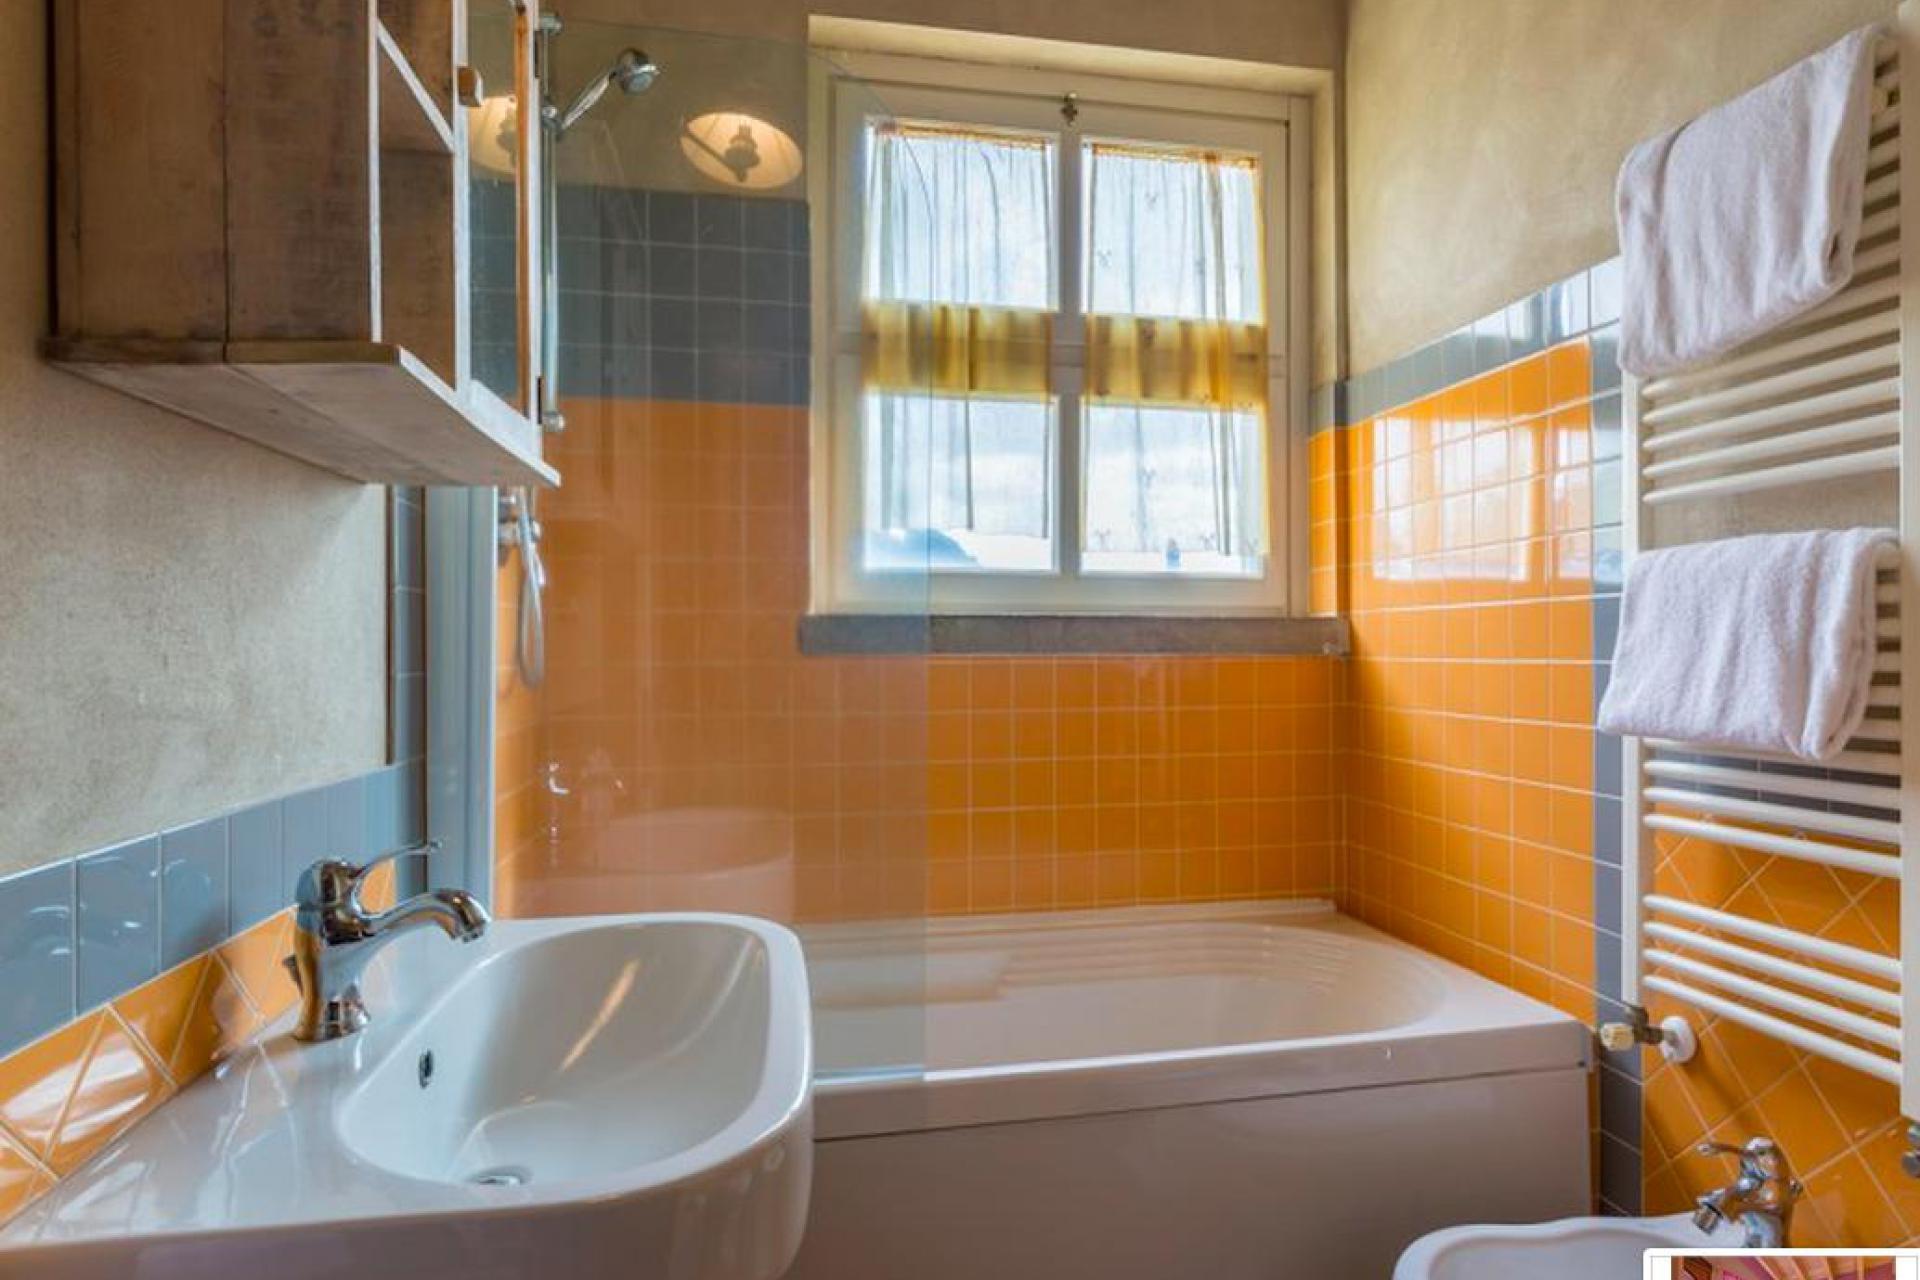 Agriturismo Toscane 16 appartementen nabij Toscaanse kust | myitaly.nl